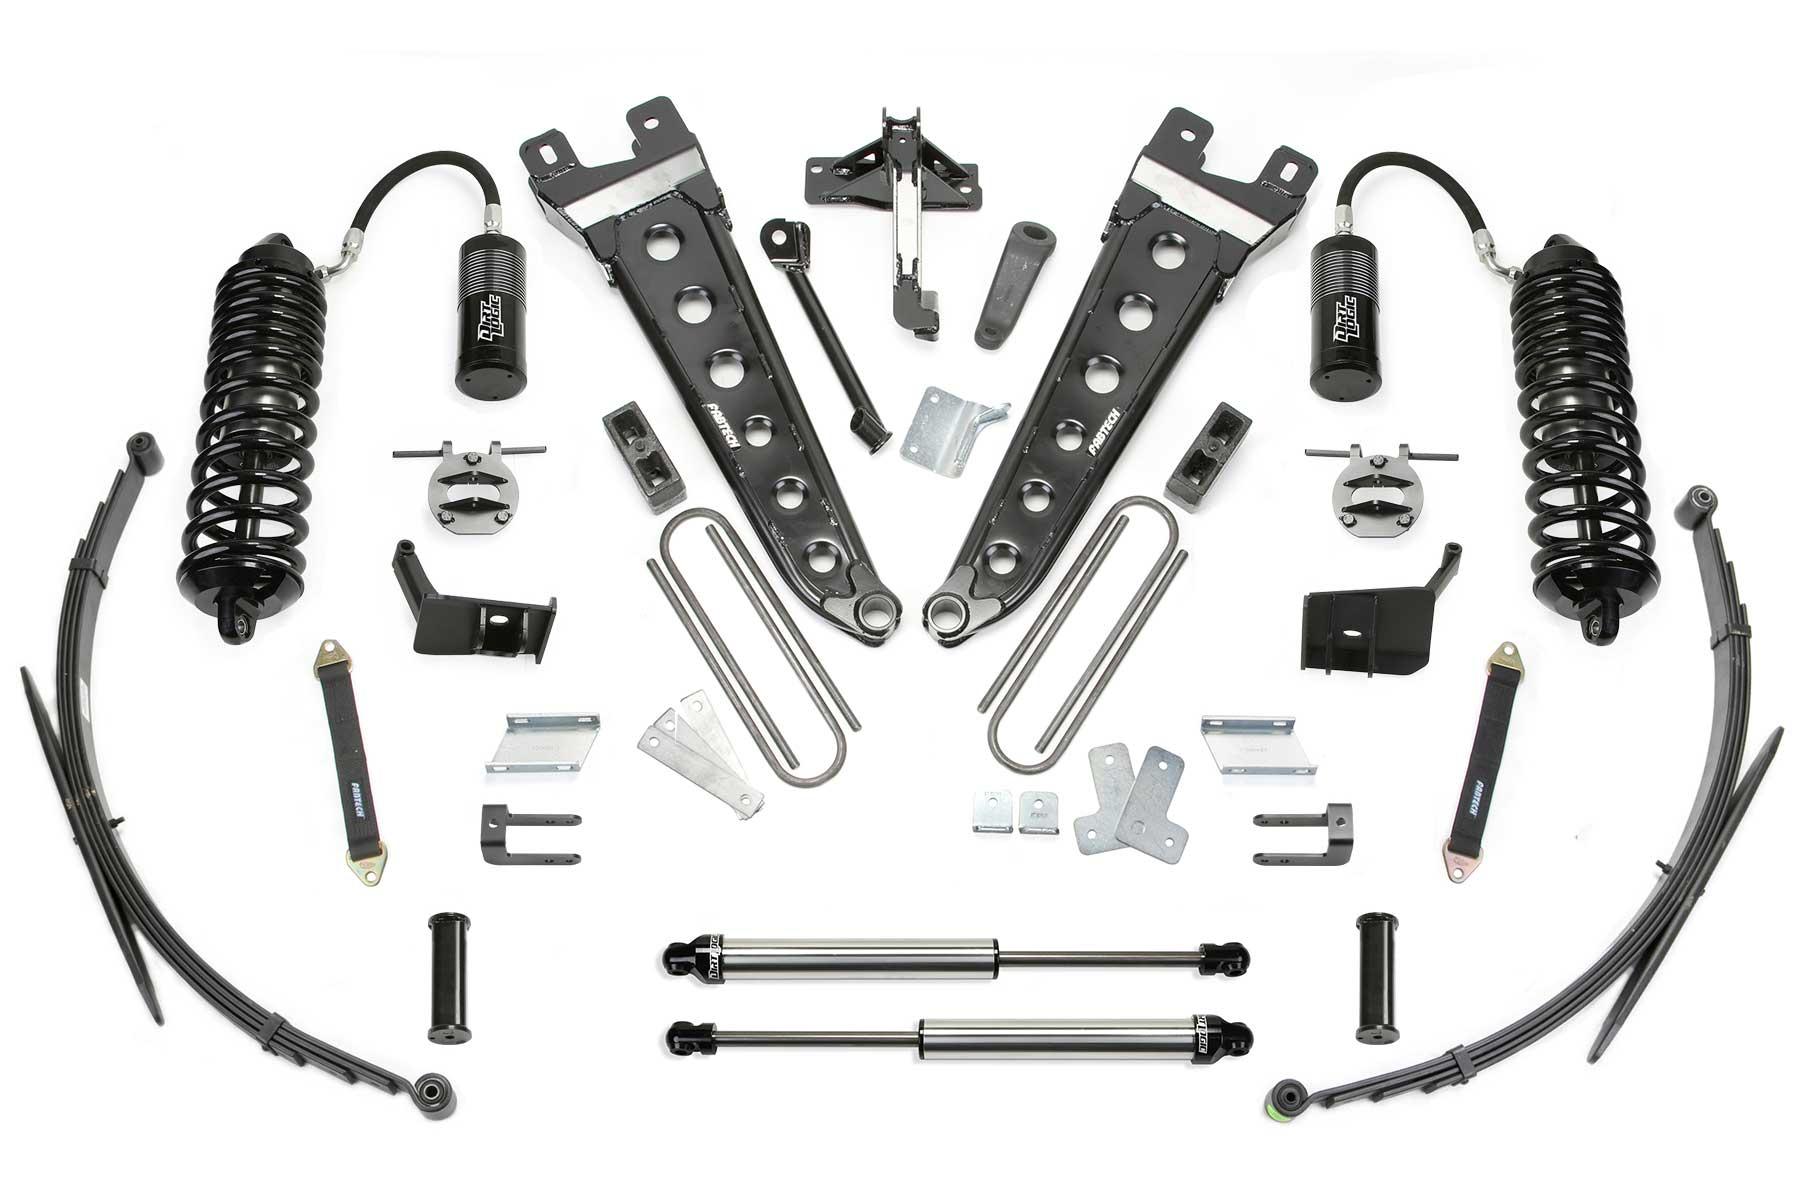 8 Radius Arm System W Front Dirt Logic 4 0 Resi Coilovers Amp Rear Dirt Logic 2 25 Shocks